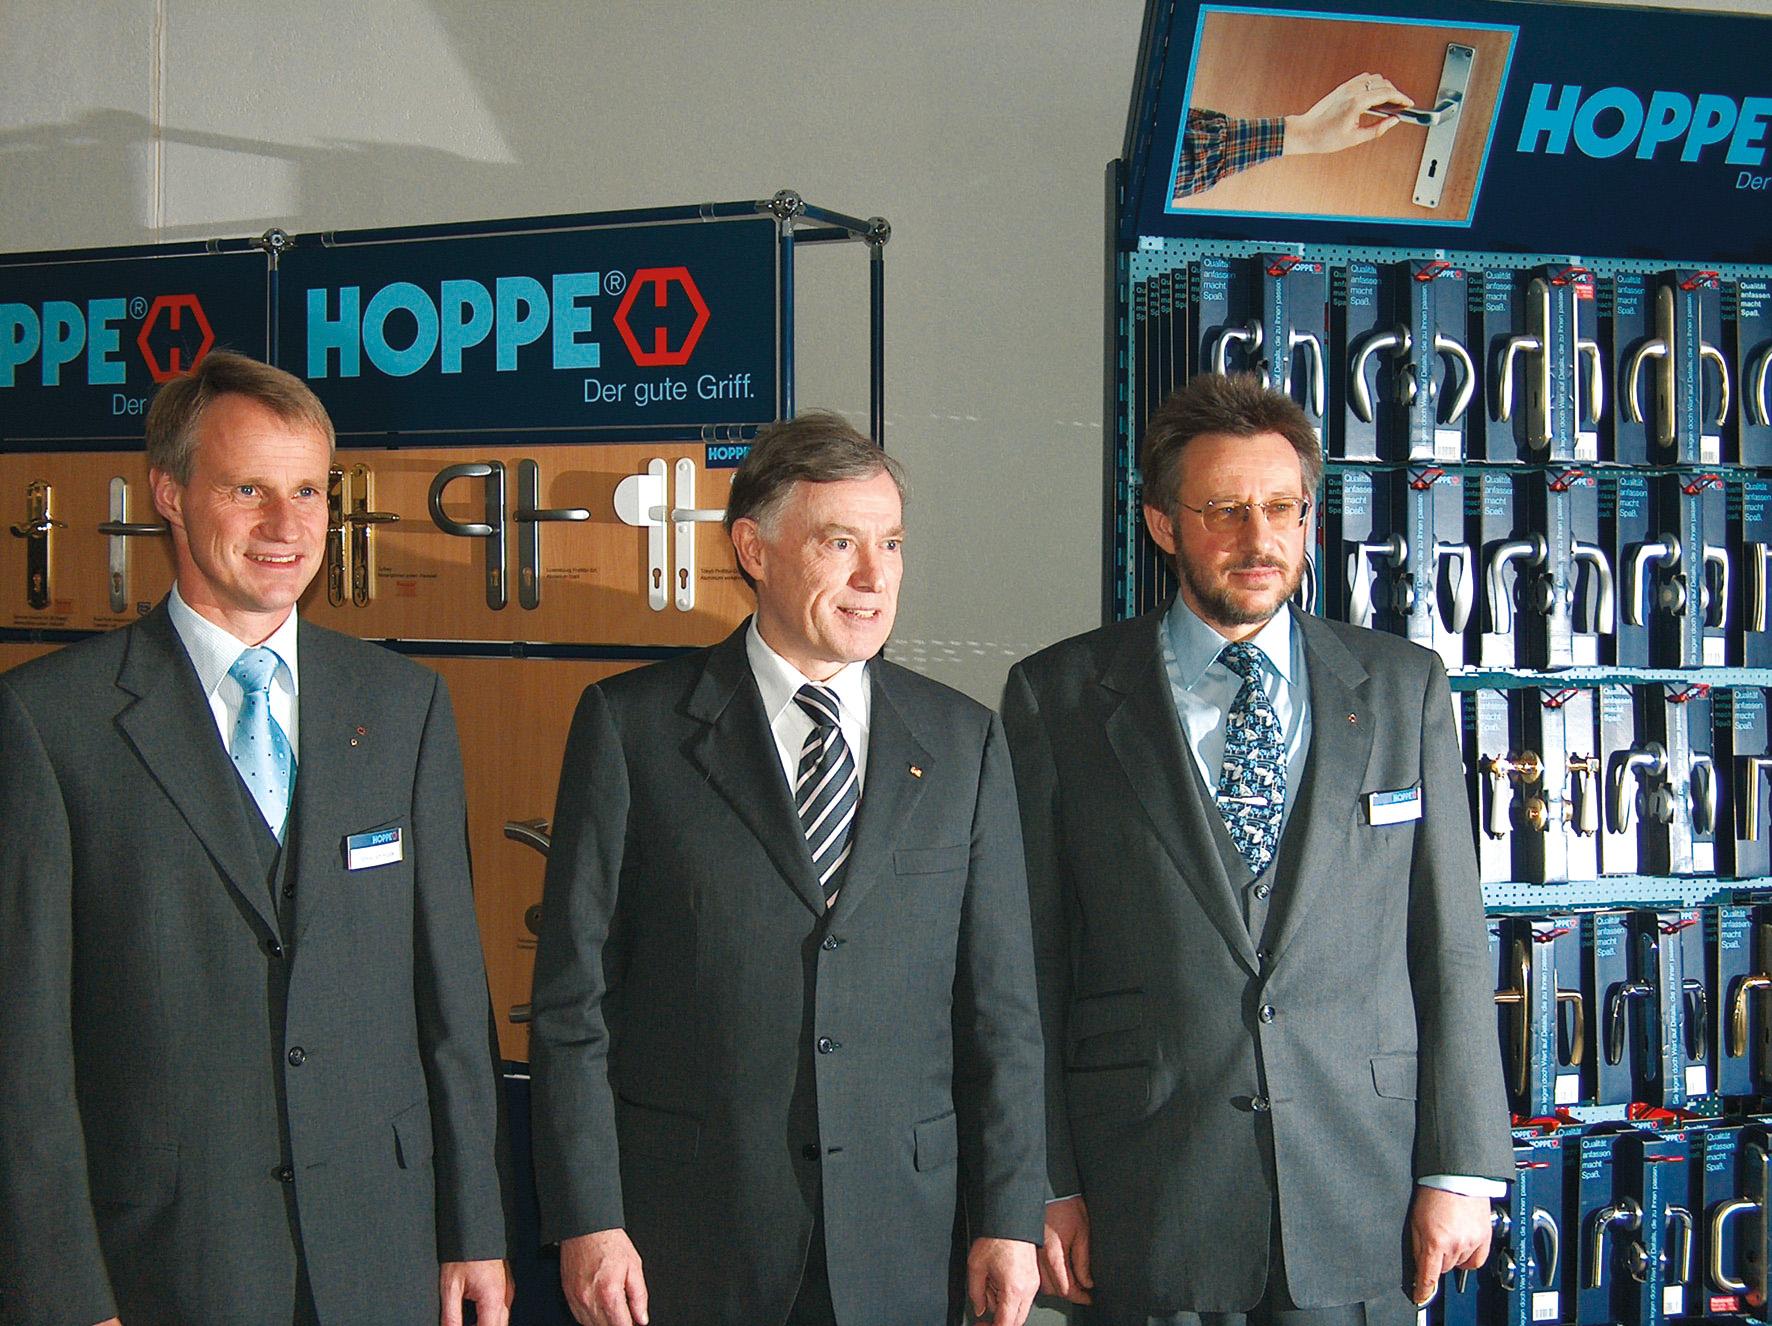 09.12.2005: визит федерального президента Х. Кёлера (в центре) на завод ХОППЕ в Кроттендорфе